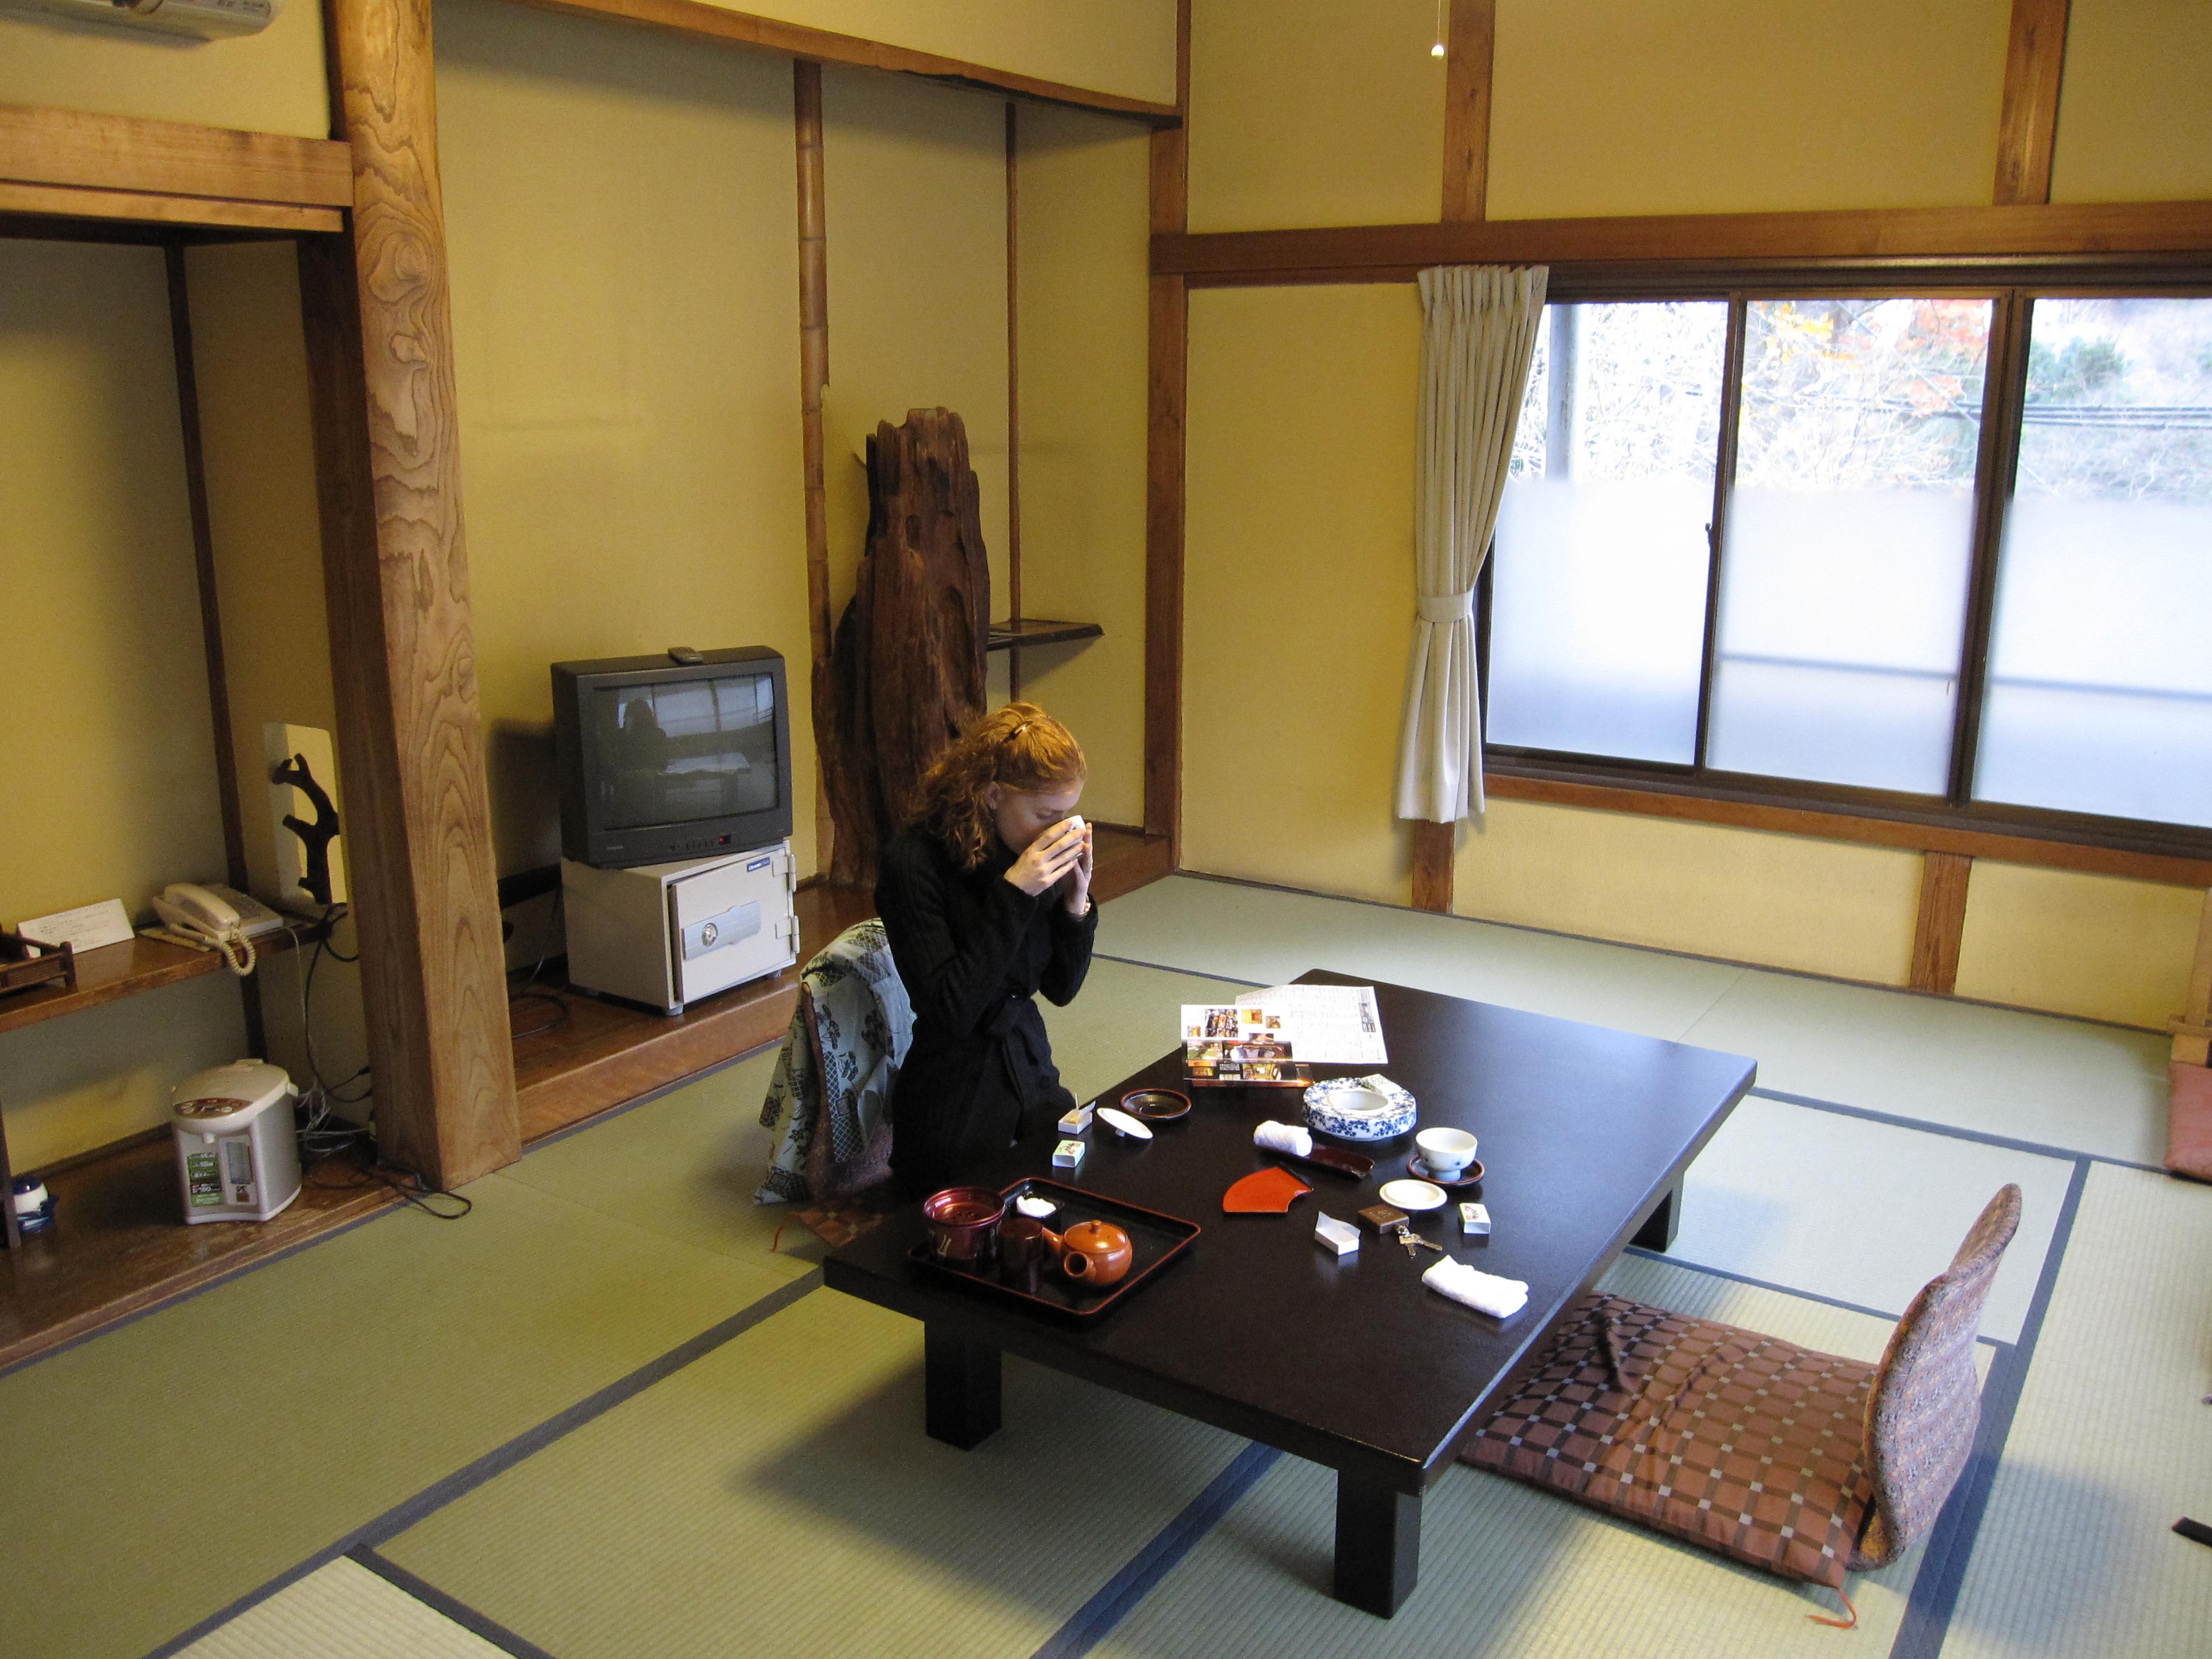 Tea at the ryokan